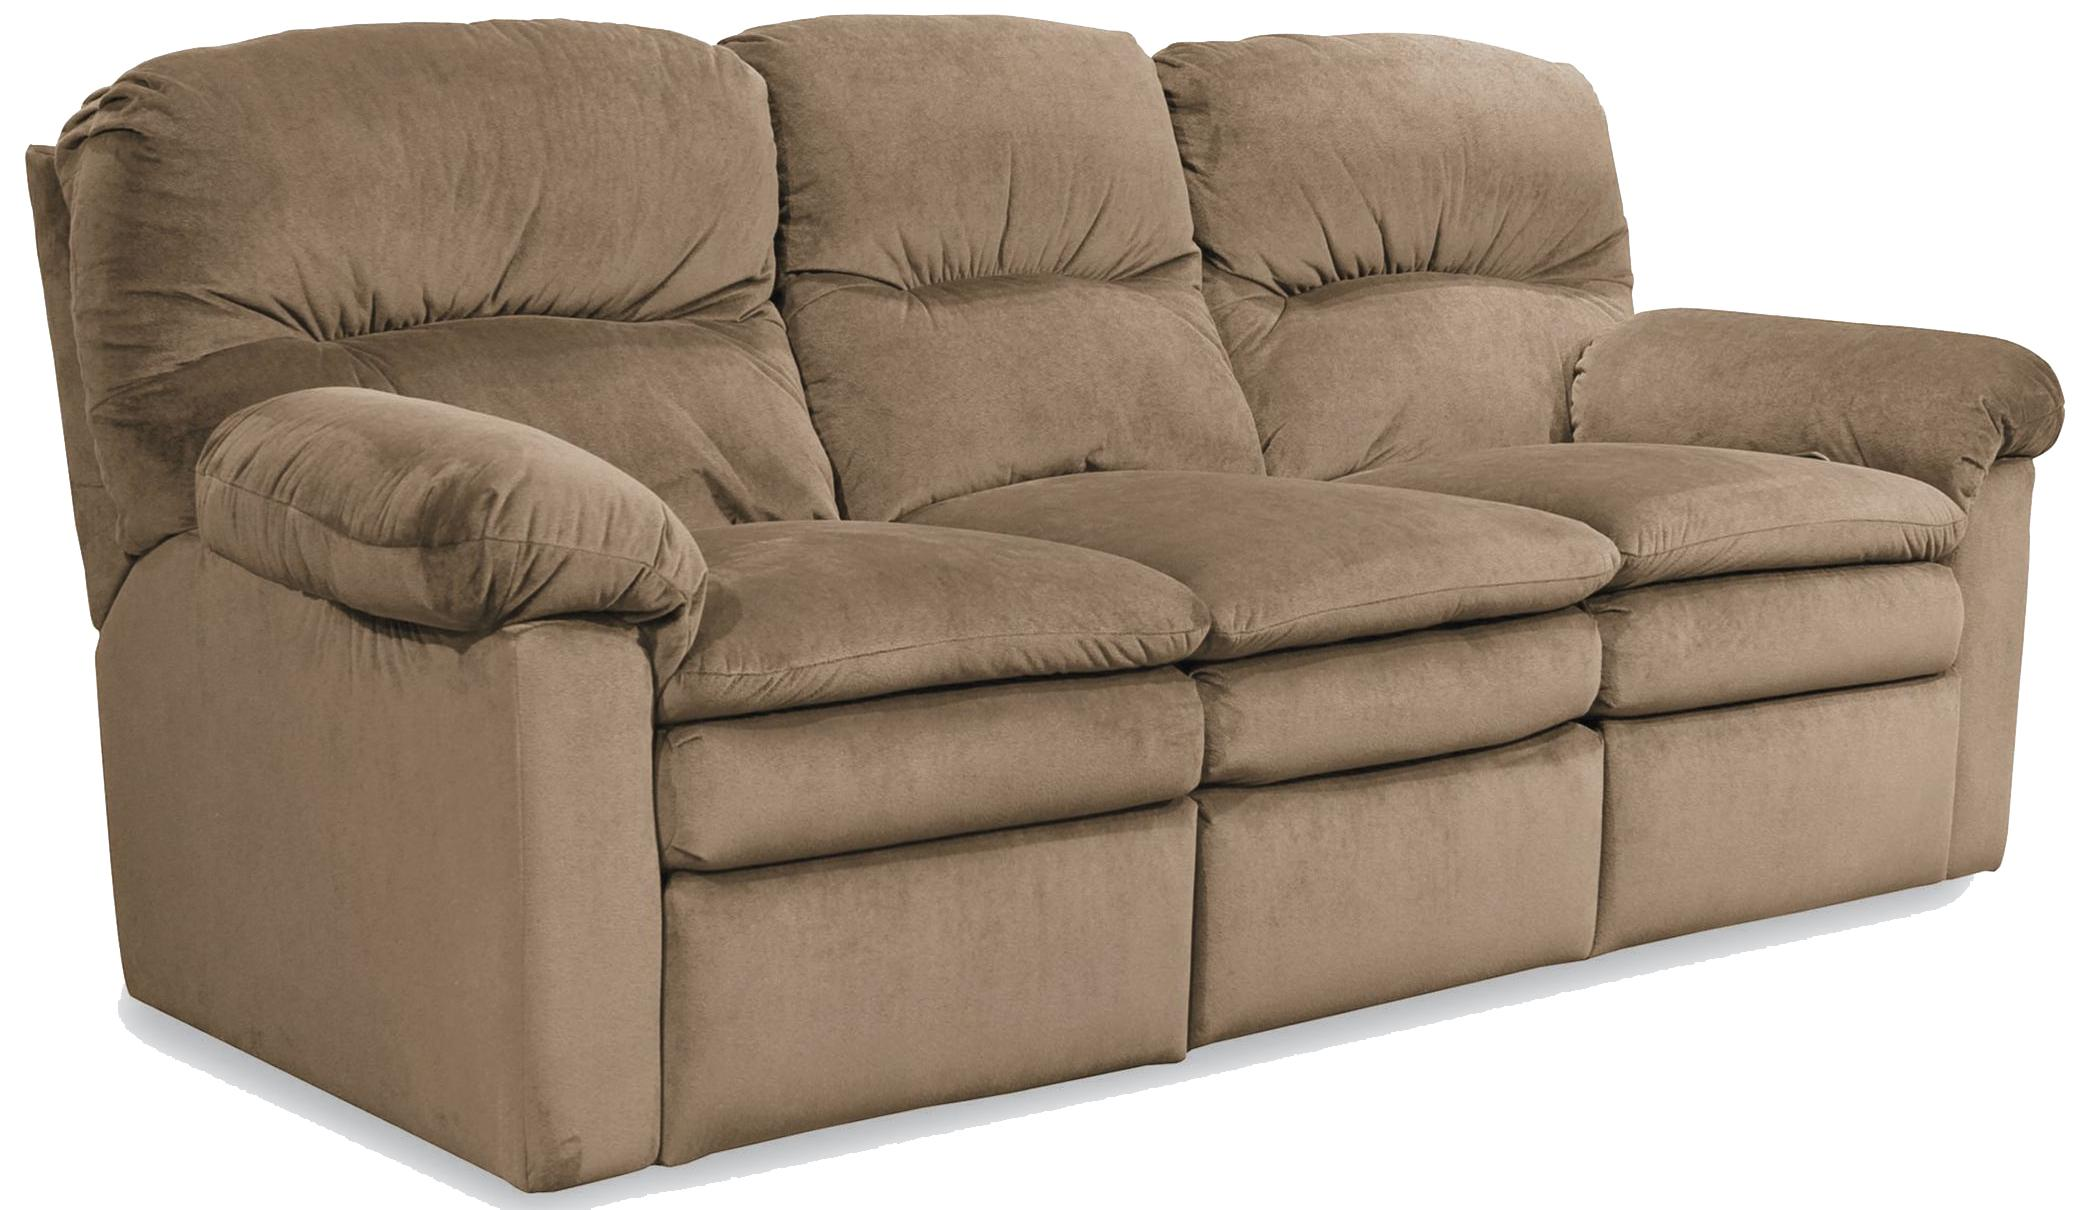 lane triple reclining sofa cushions replacement foam touchdown double lindy 39s furniture